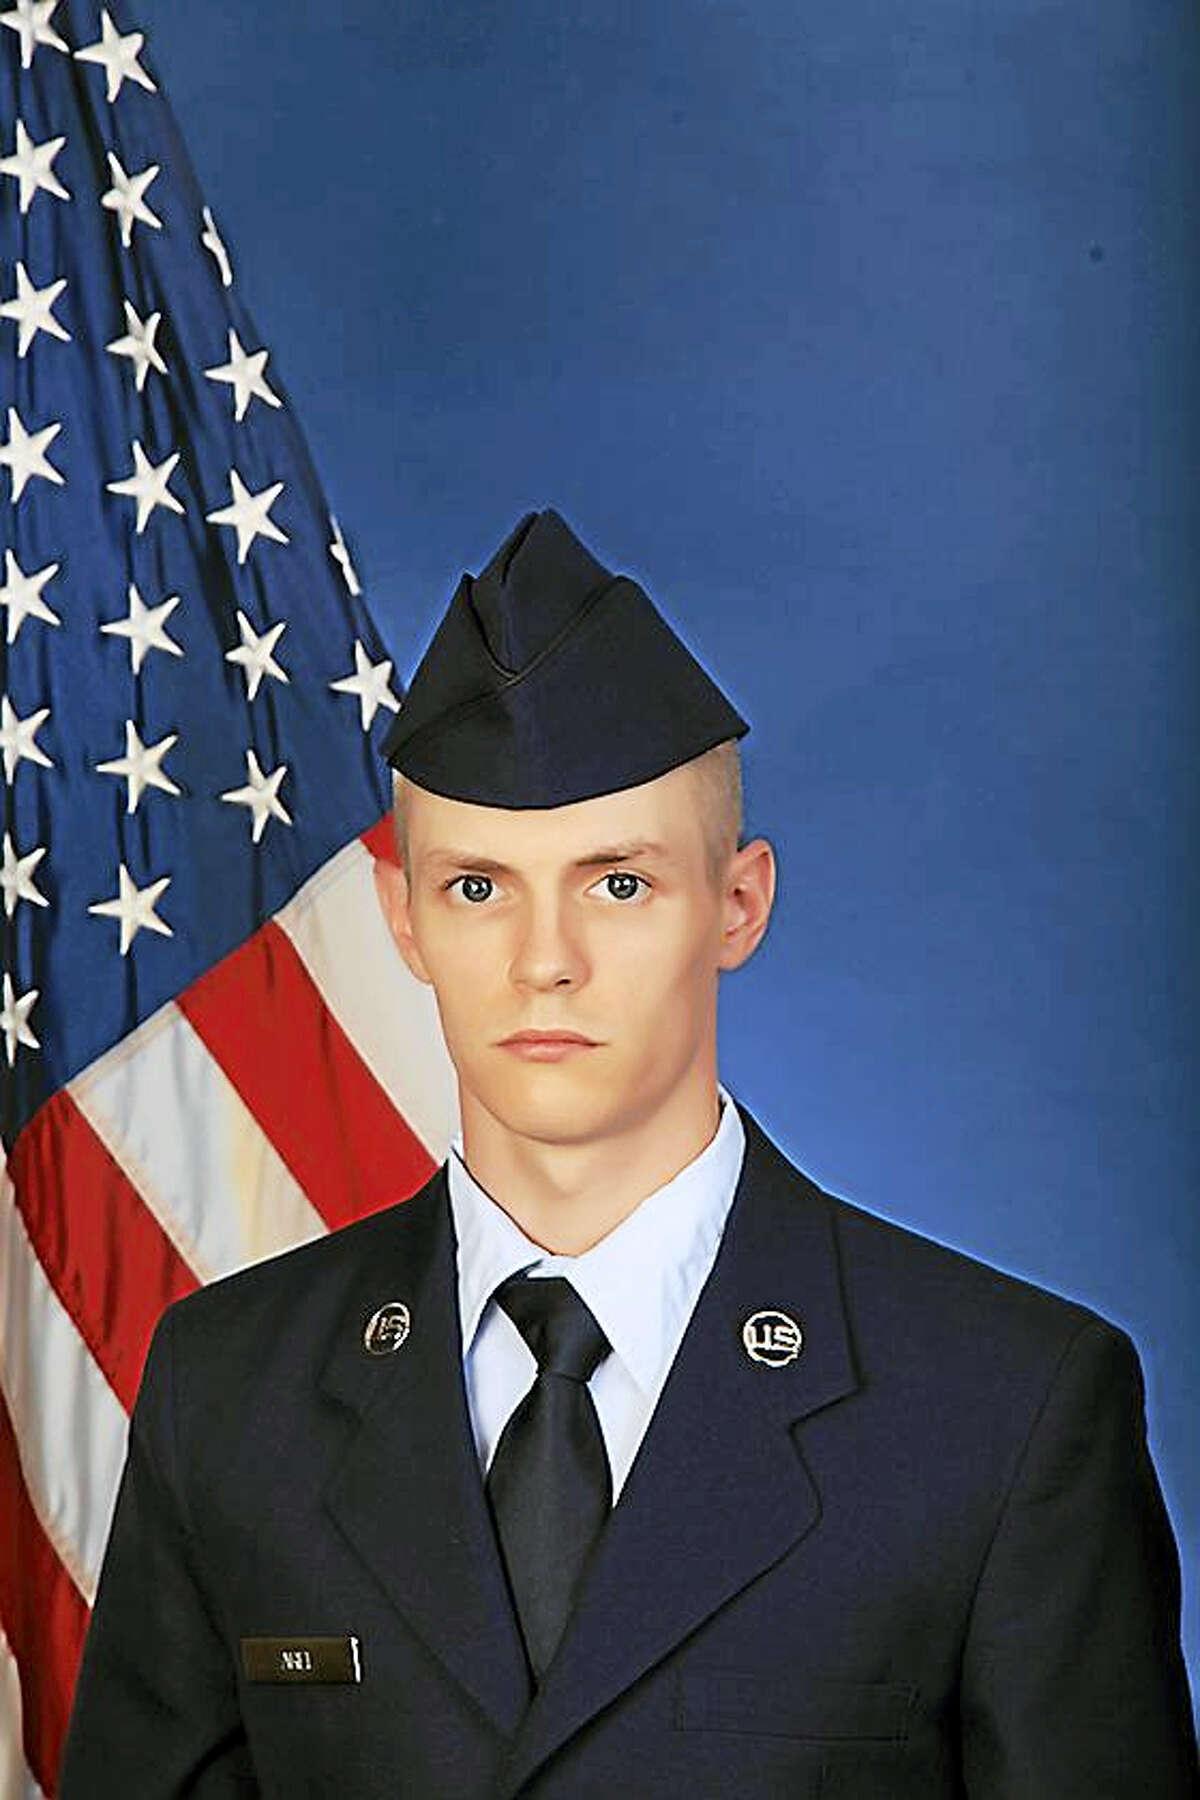 Airman Kevin Arel